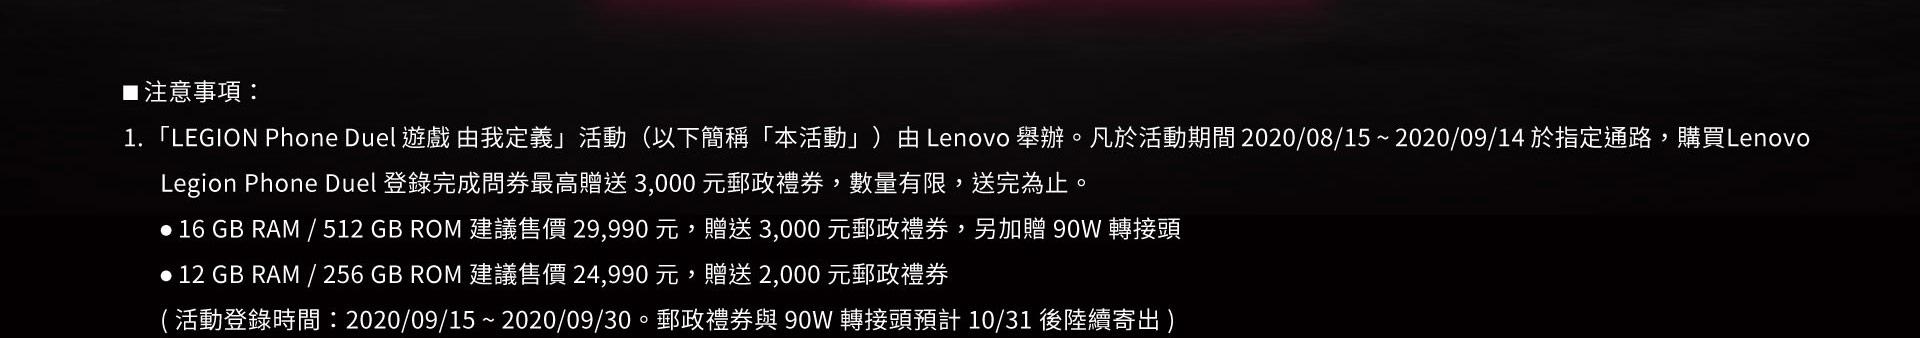 Lenovo phone duel